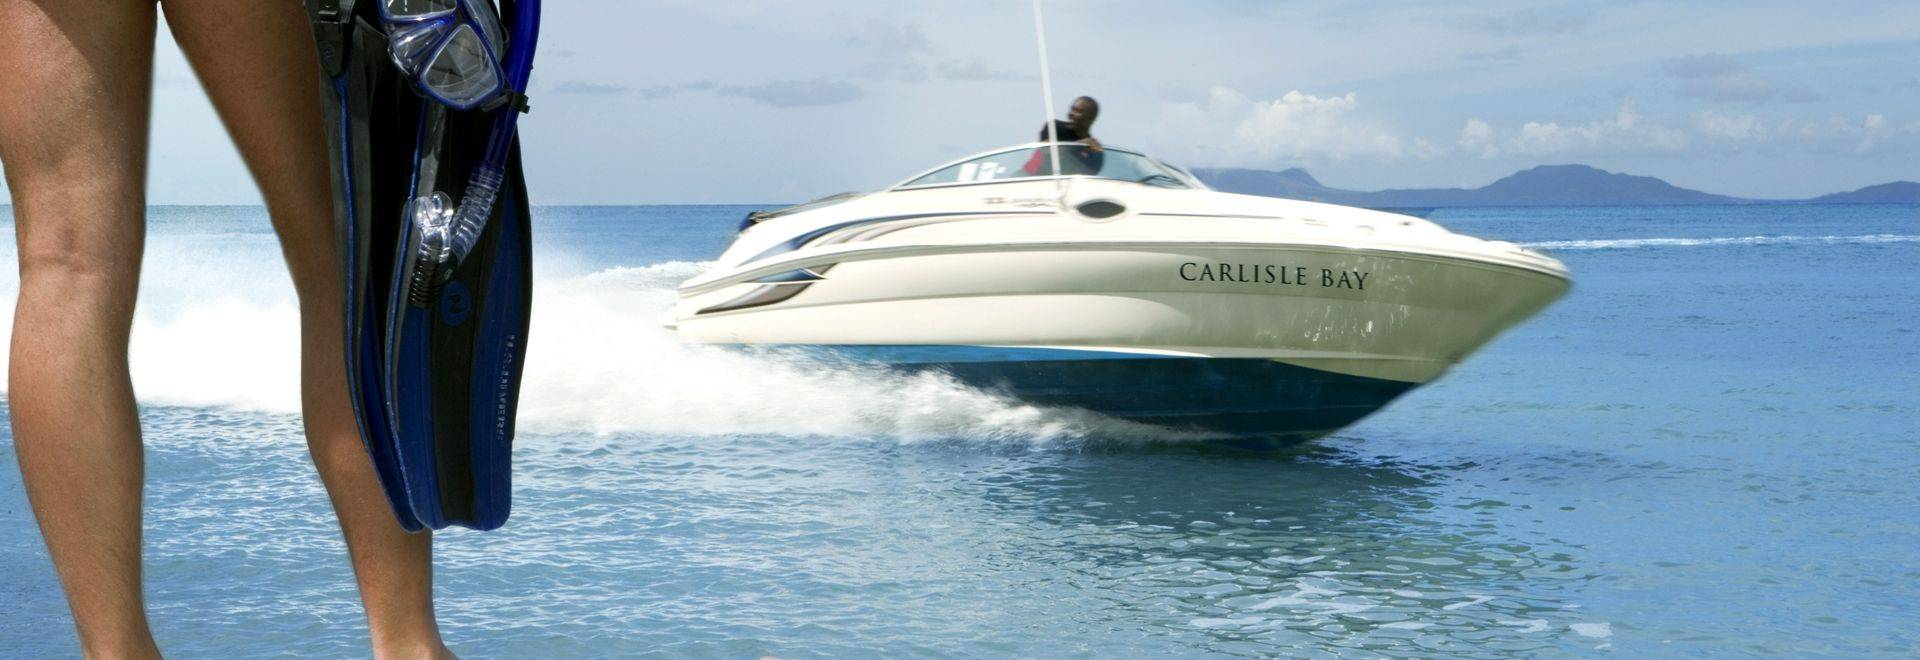 Carlisle-Bay-snorkelling.jpg